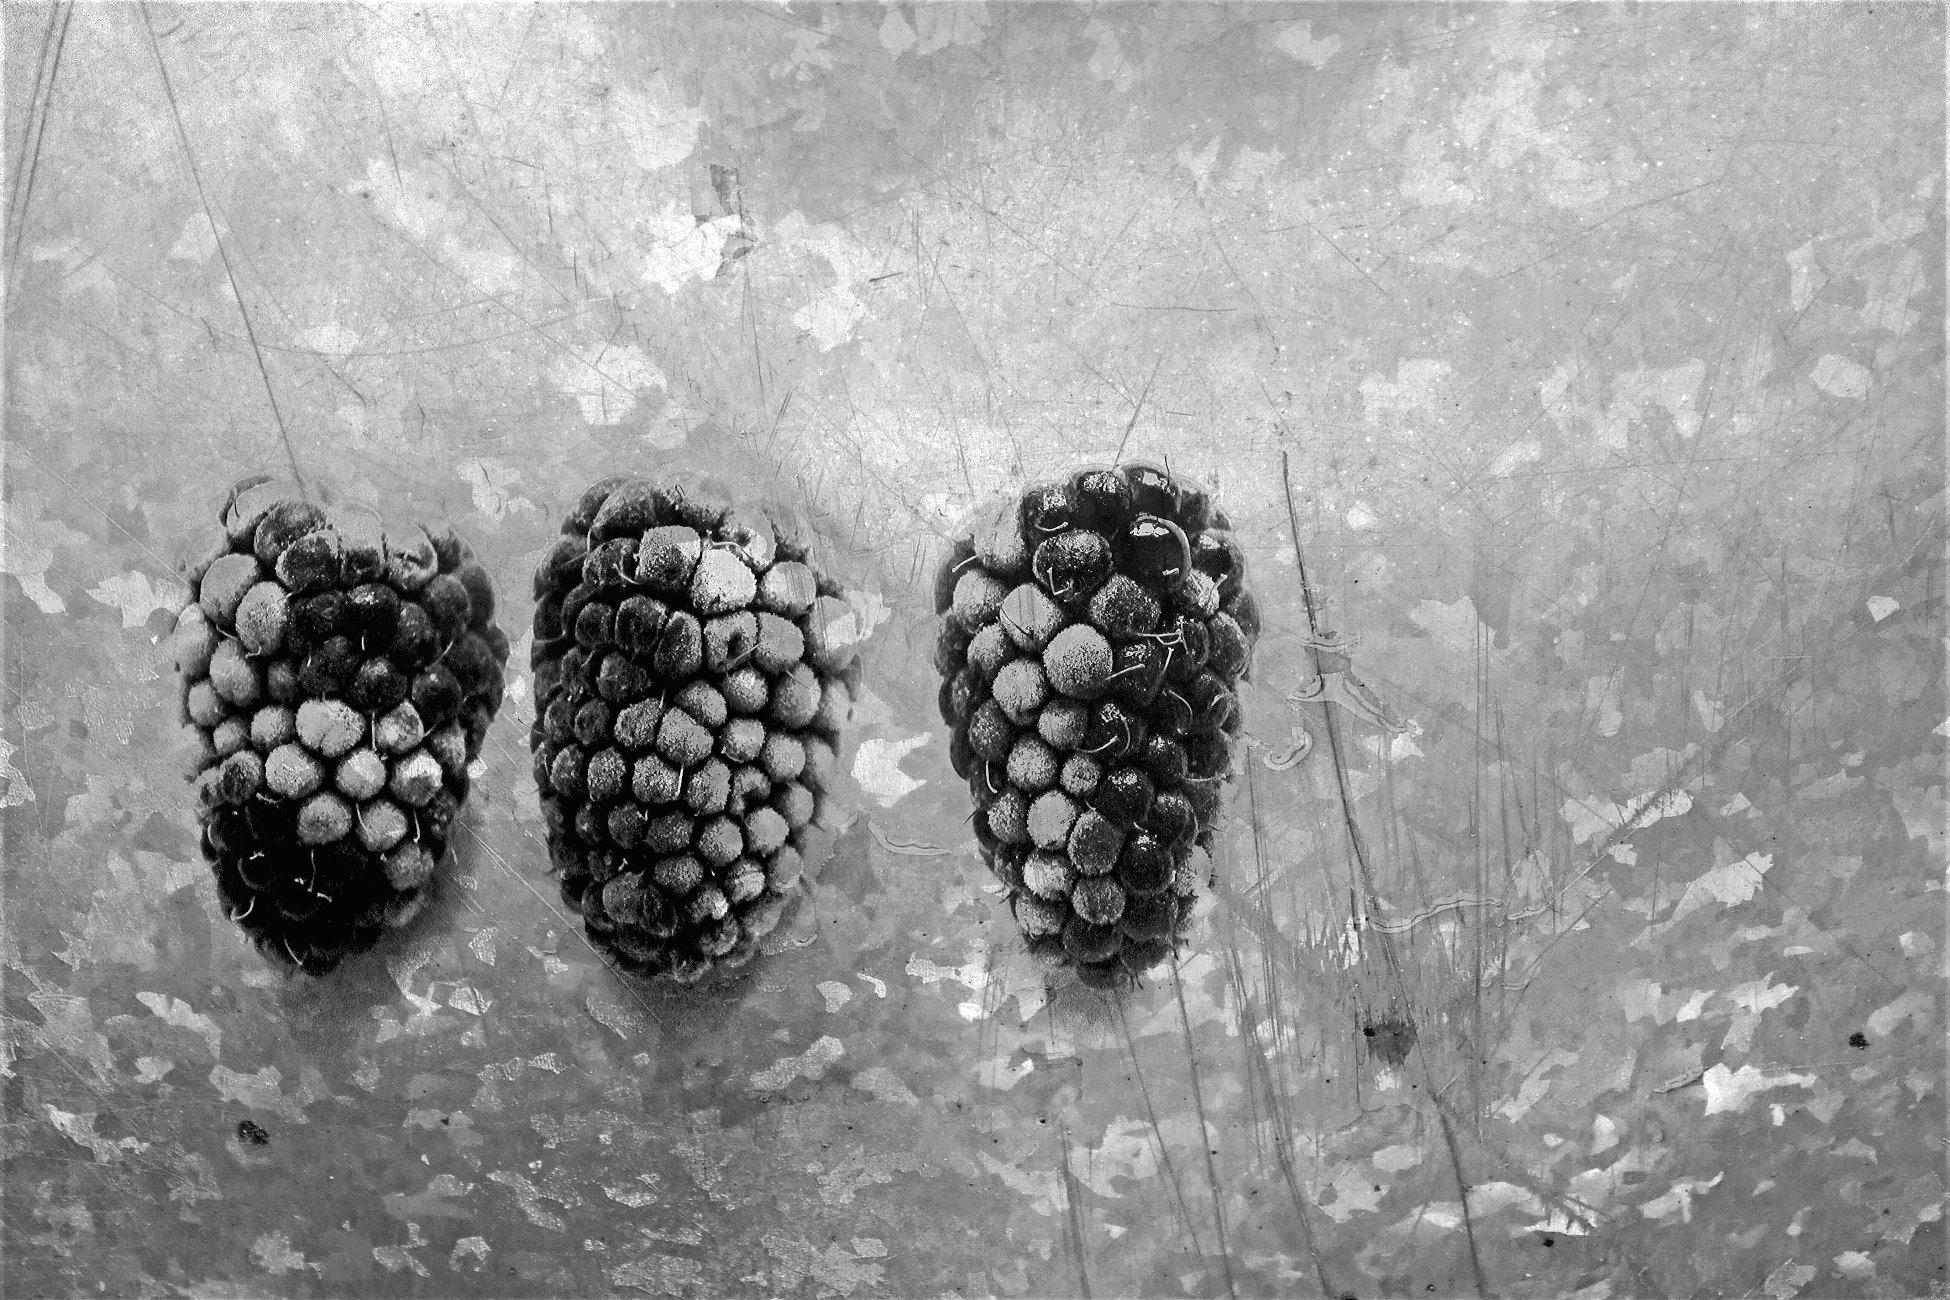 Defrosting loganberries - mono